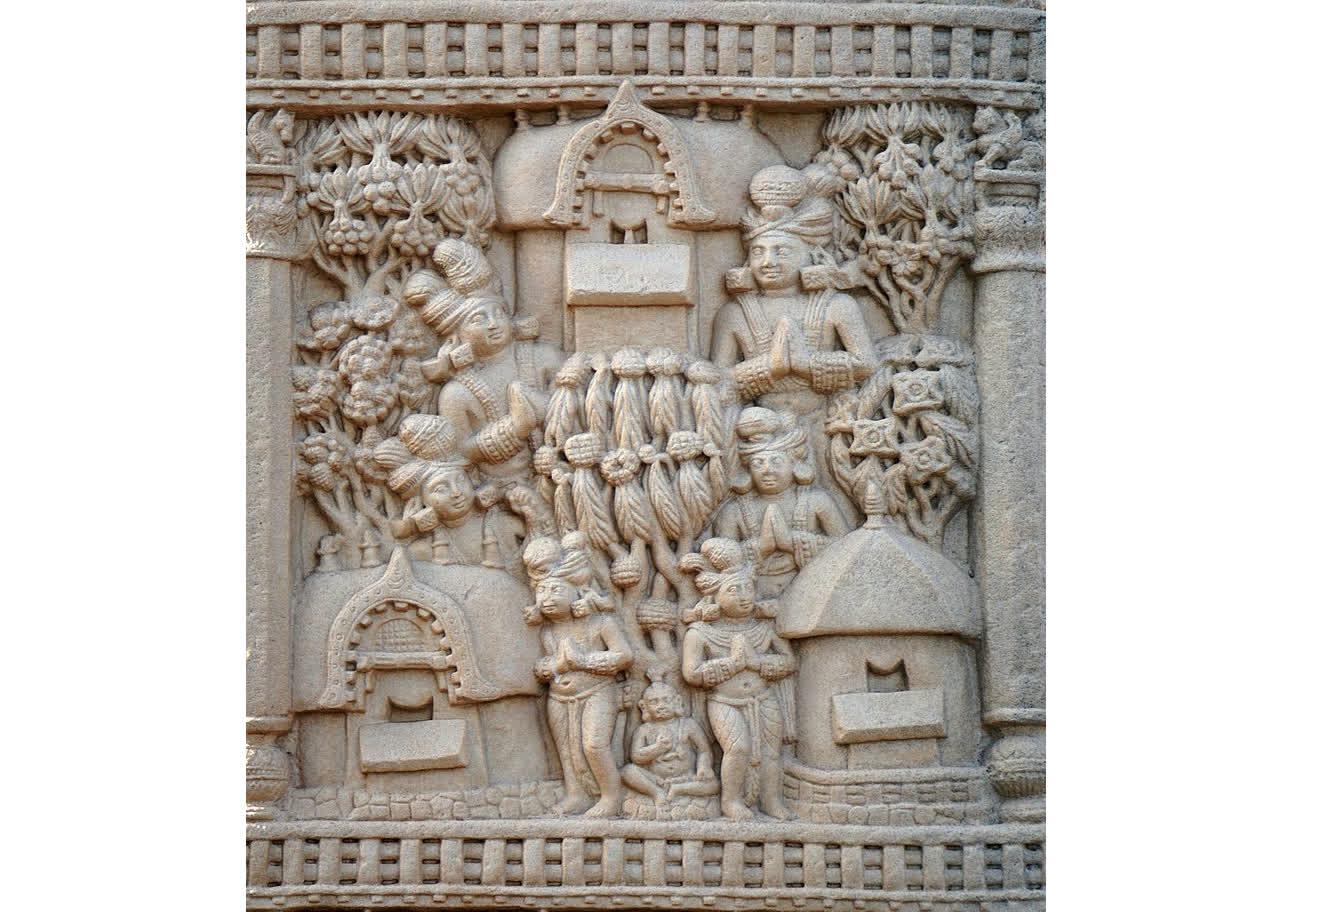 The Jetavana at Shravasti as depicted at Sanchi